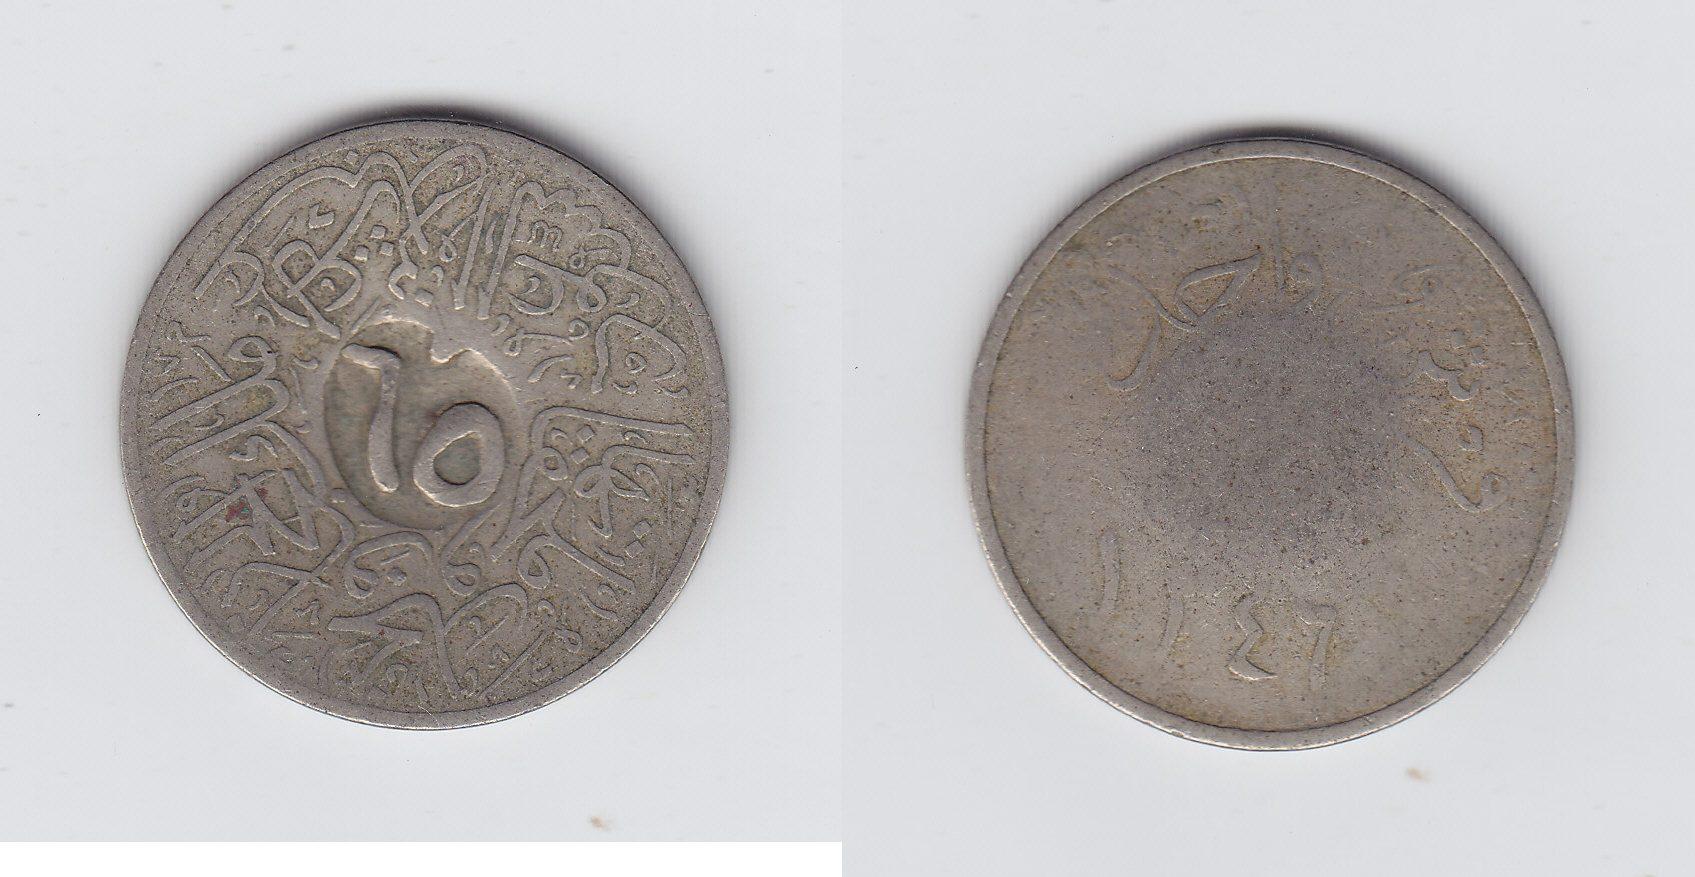 Saudi-Arabien Ggst.65 auf 1 G 1346 s-ss